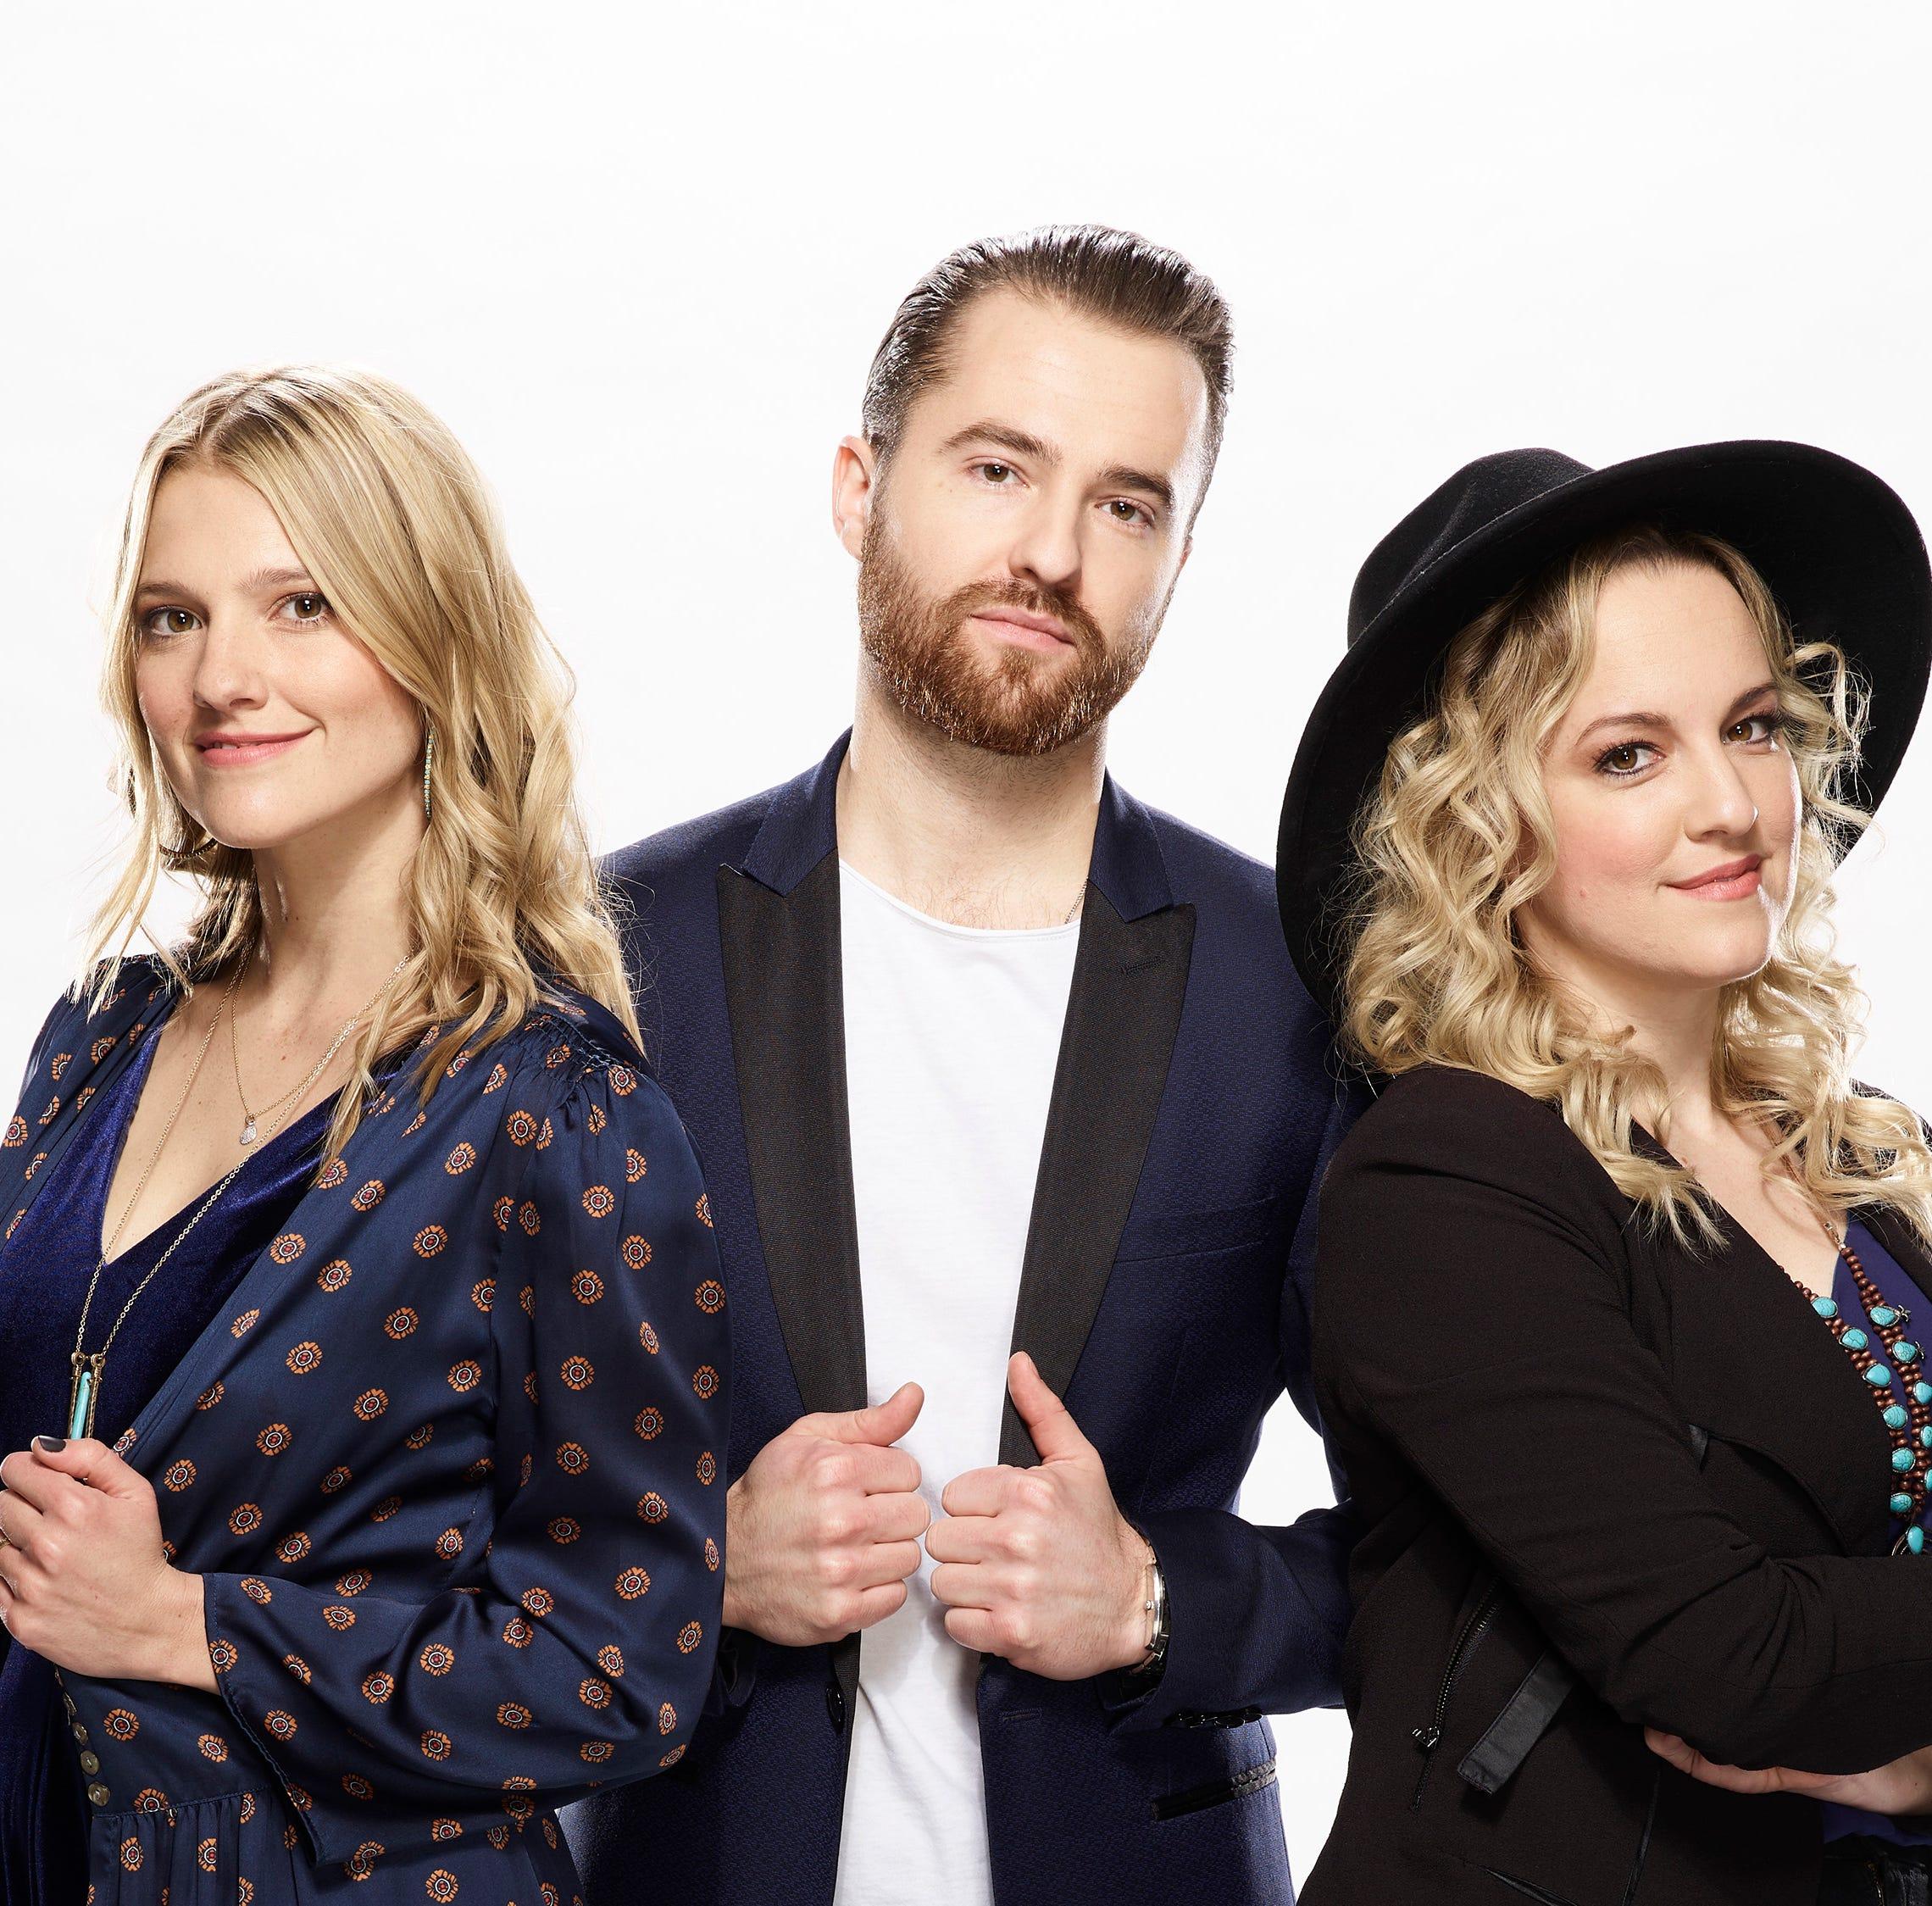 'The Voice': Nashville's Abby Kasch, The Bundys, Rizzi Myers prepare for battle